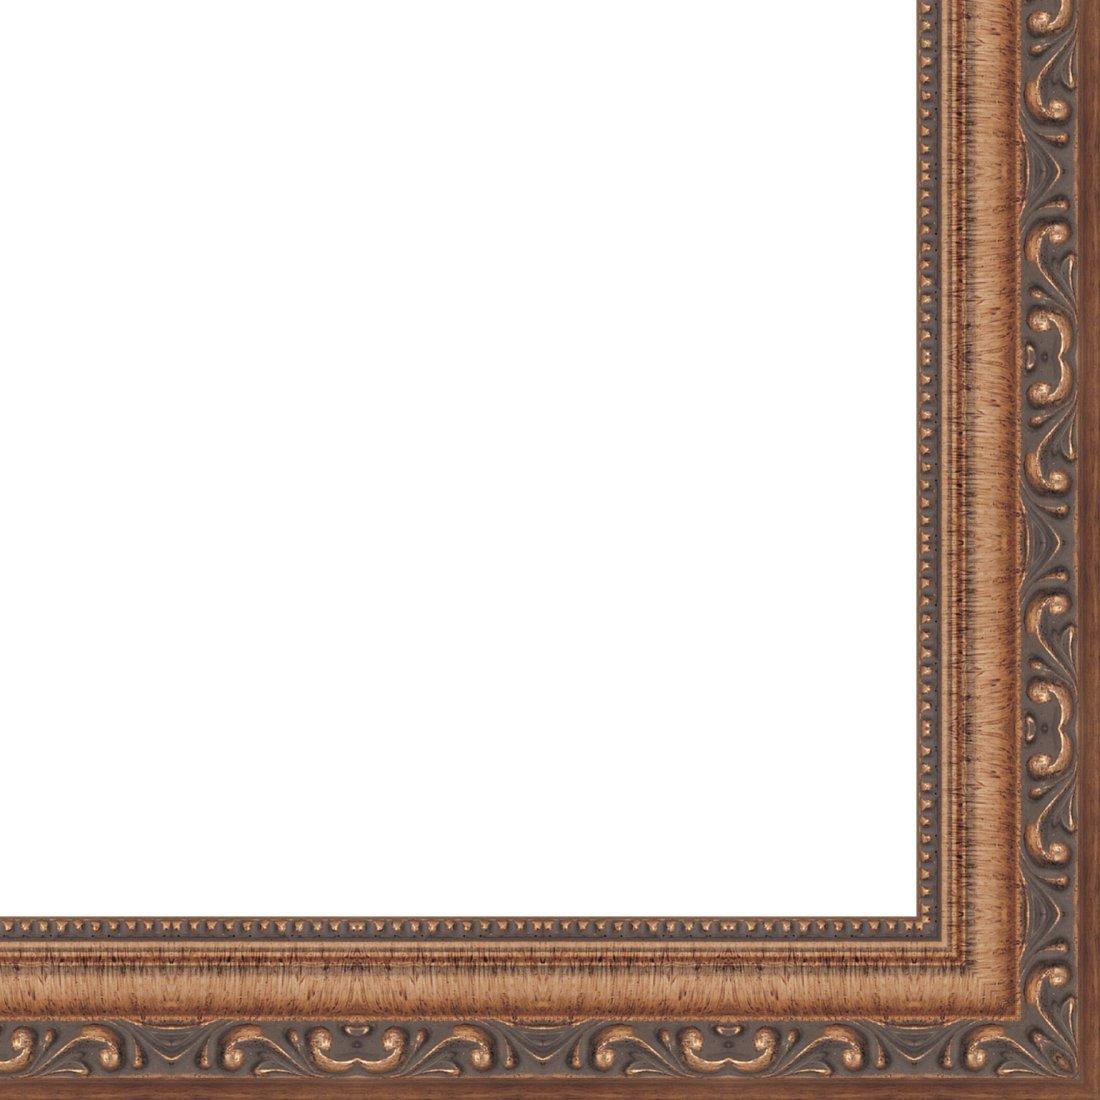 Picture Frame Moulding (Wood) 18ft bundle - Traditional Antique Gold Finish - 1.25'' width - 3/8'' rabbet depth